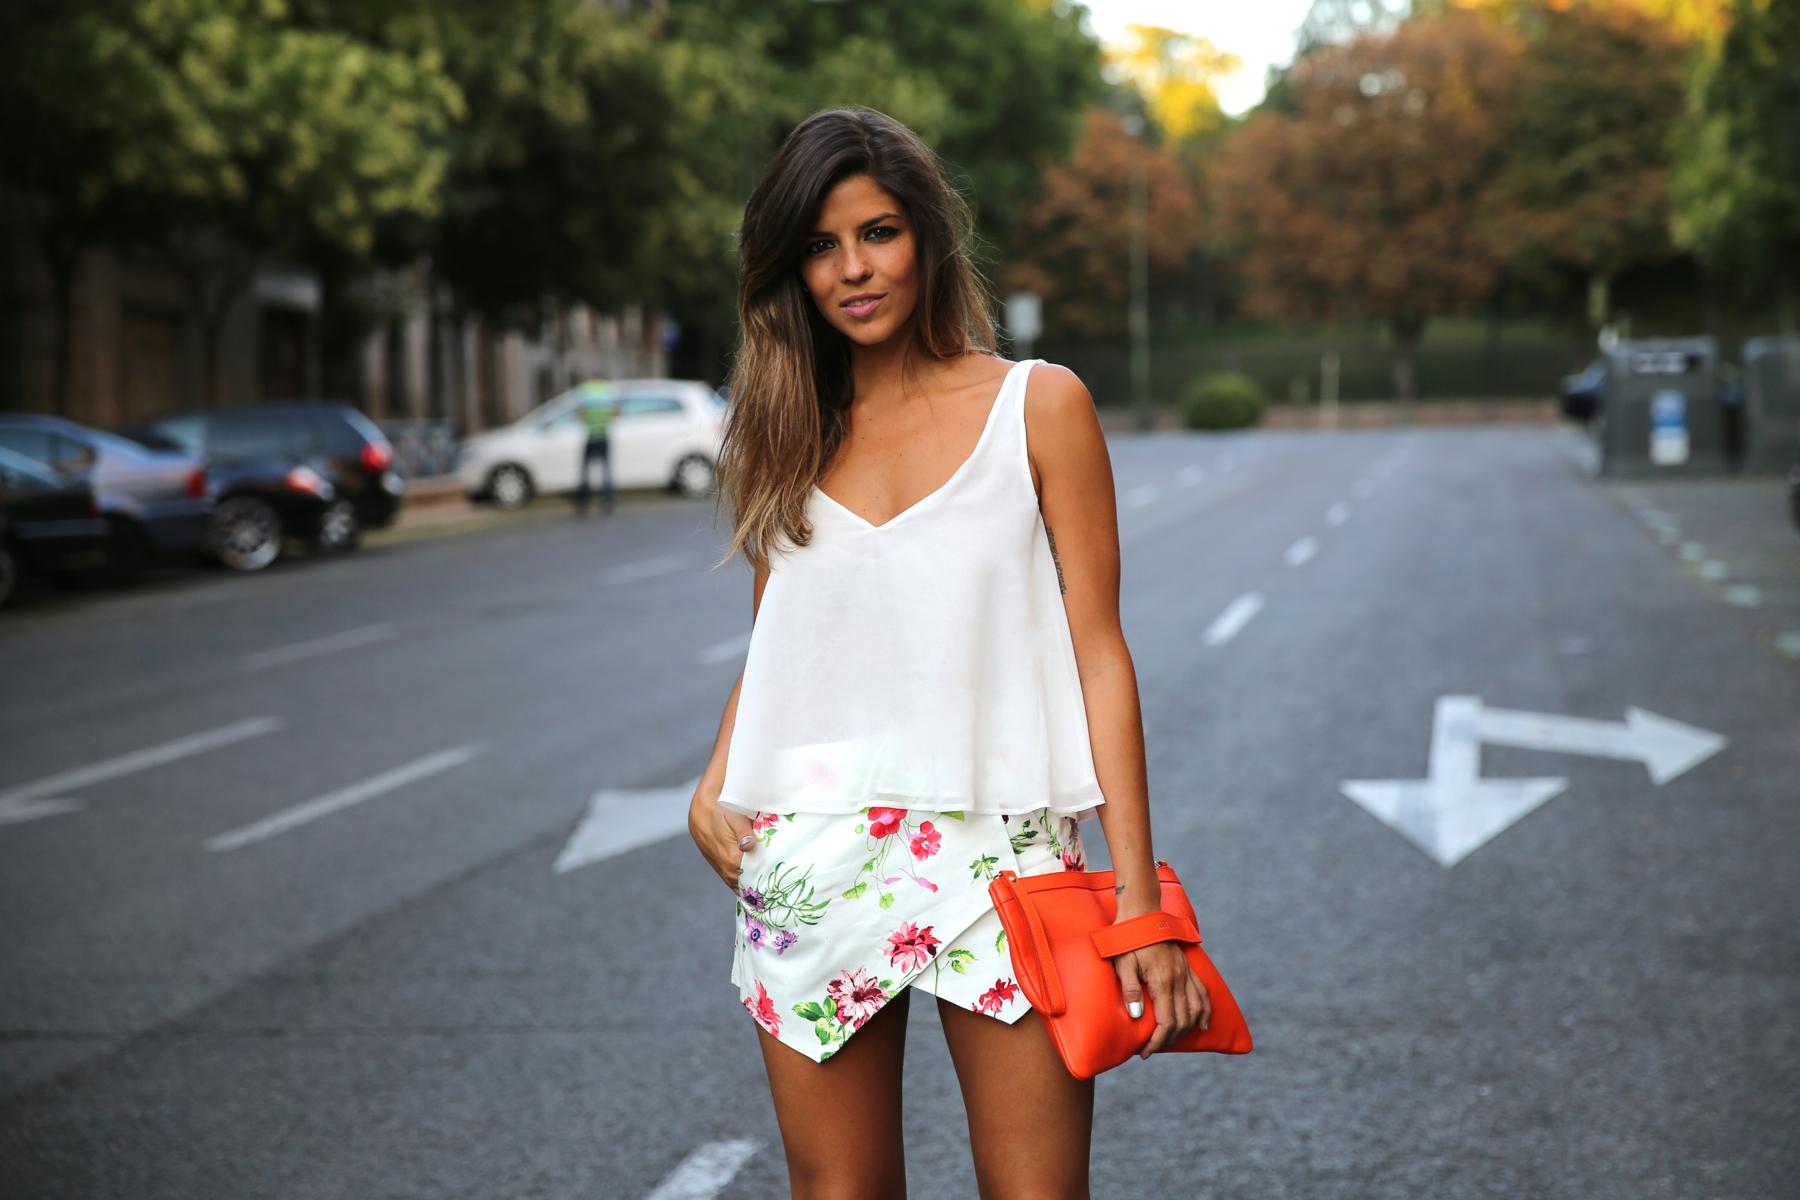 trendy_taste-look-outfit-street_style-ootd-blog-blogger-fashion_spain-moda_españa-sandalias_plateadas-silver_sandals-flower_print-falda_flores-top_blanco-6